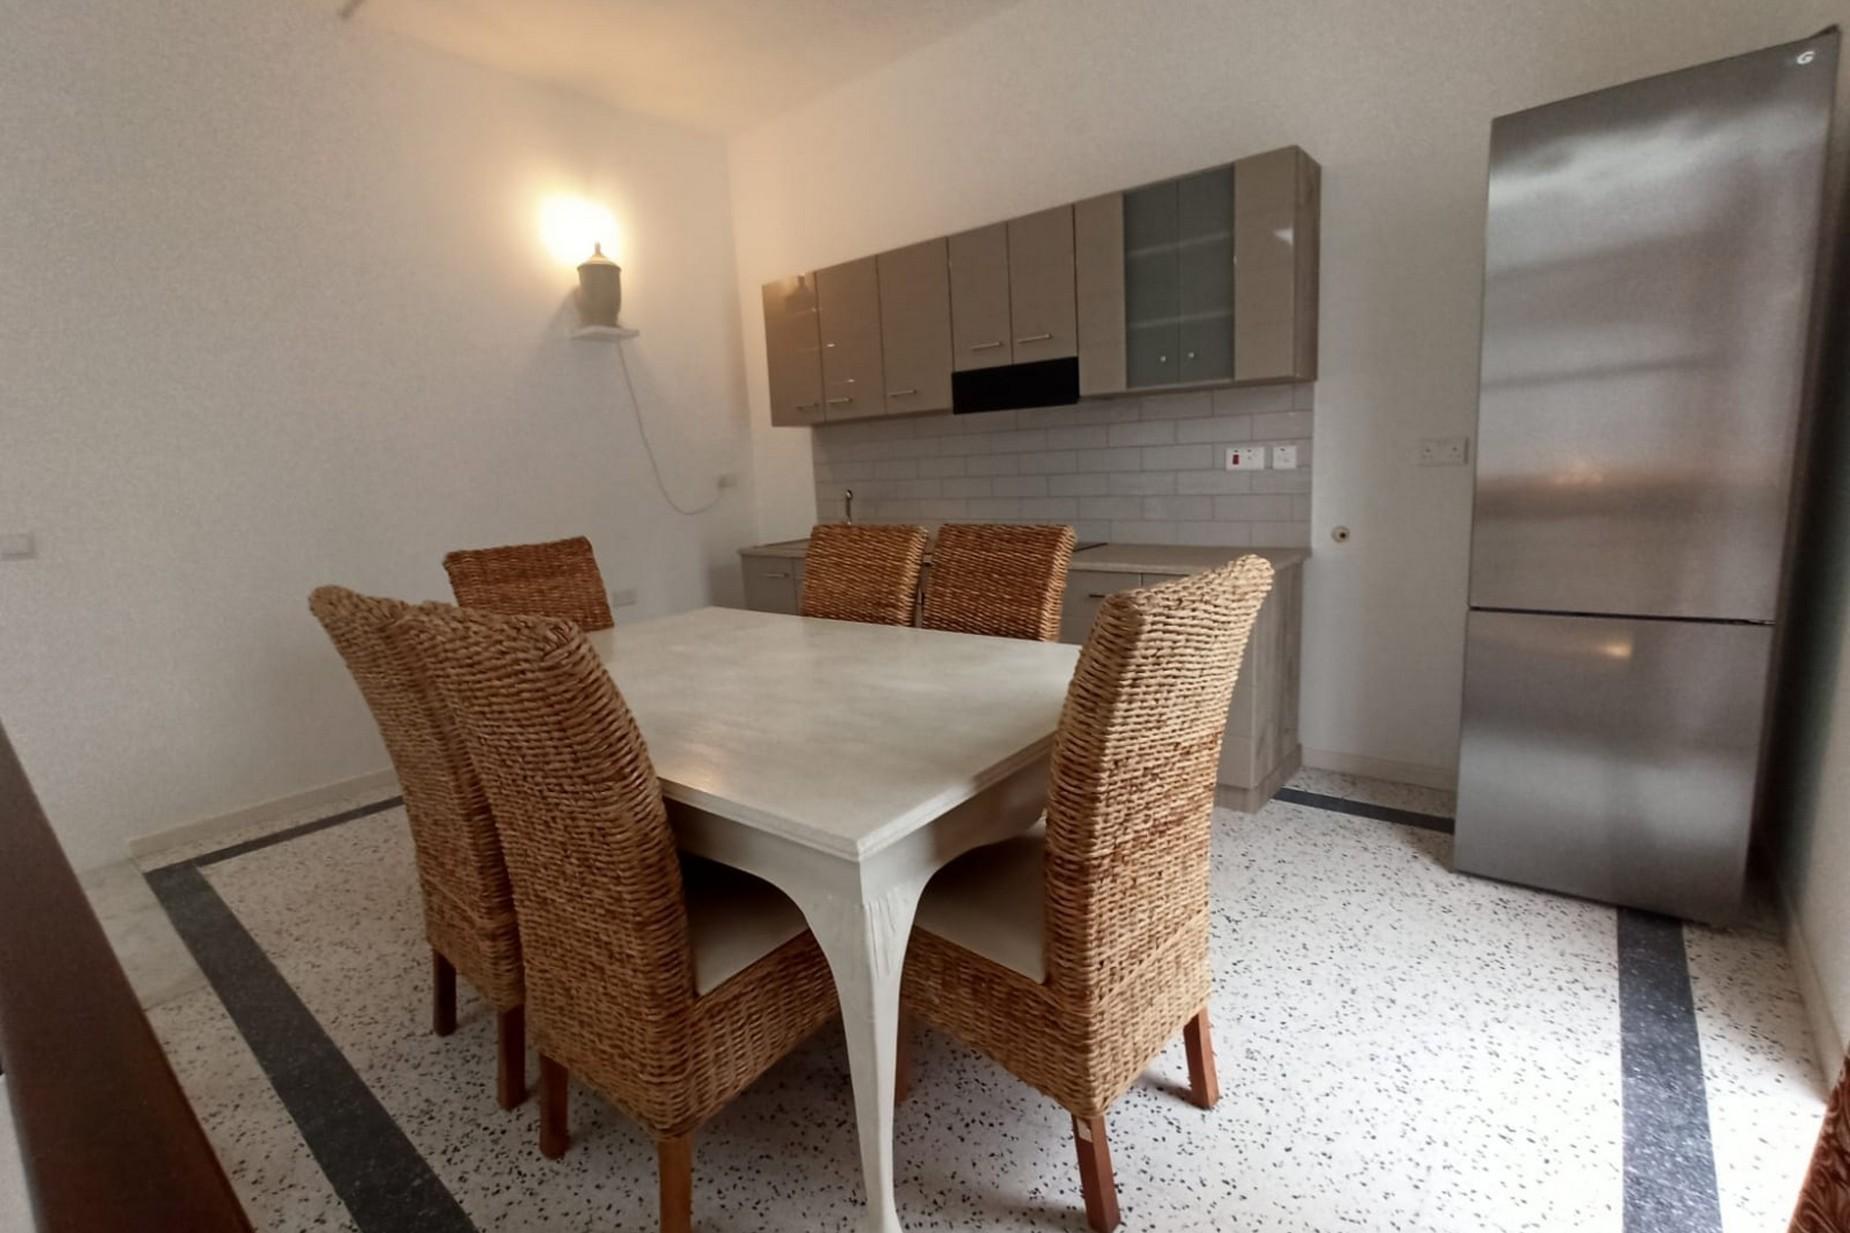 3 bed Town House For Rent in Birkirkara, Birkirkara - thumb 4